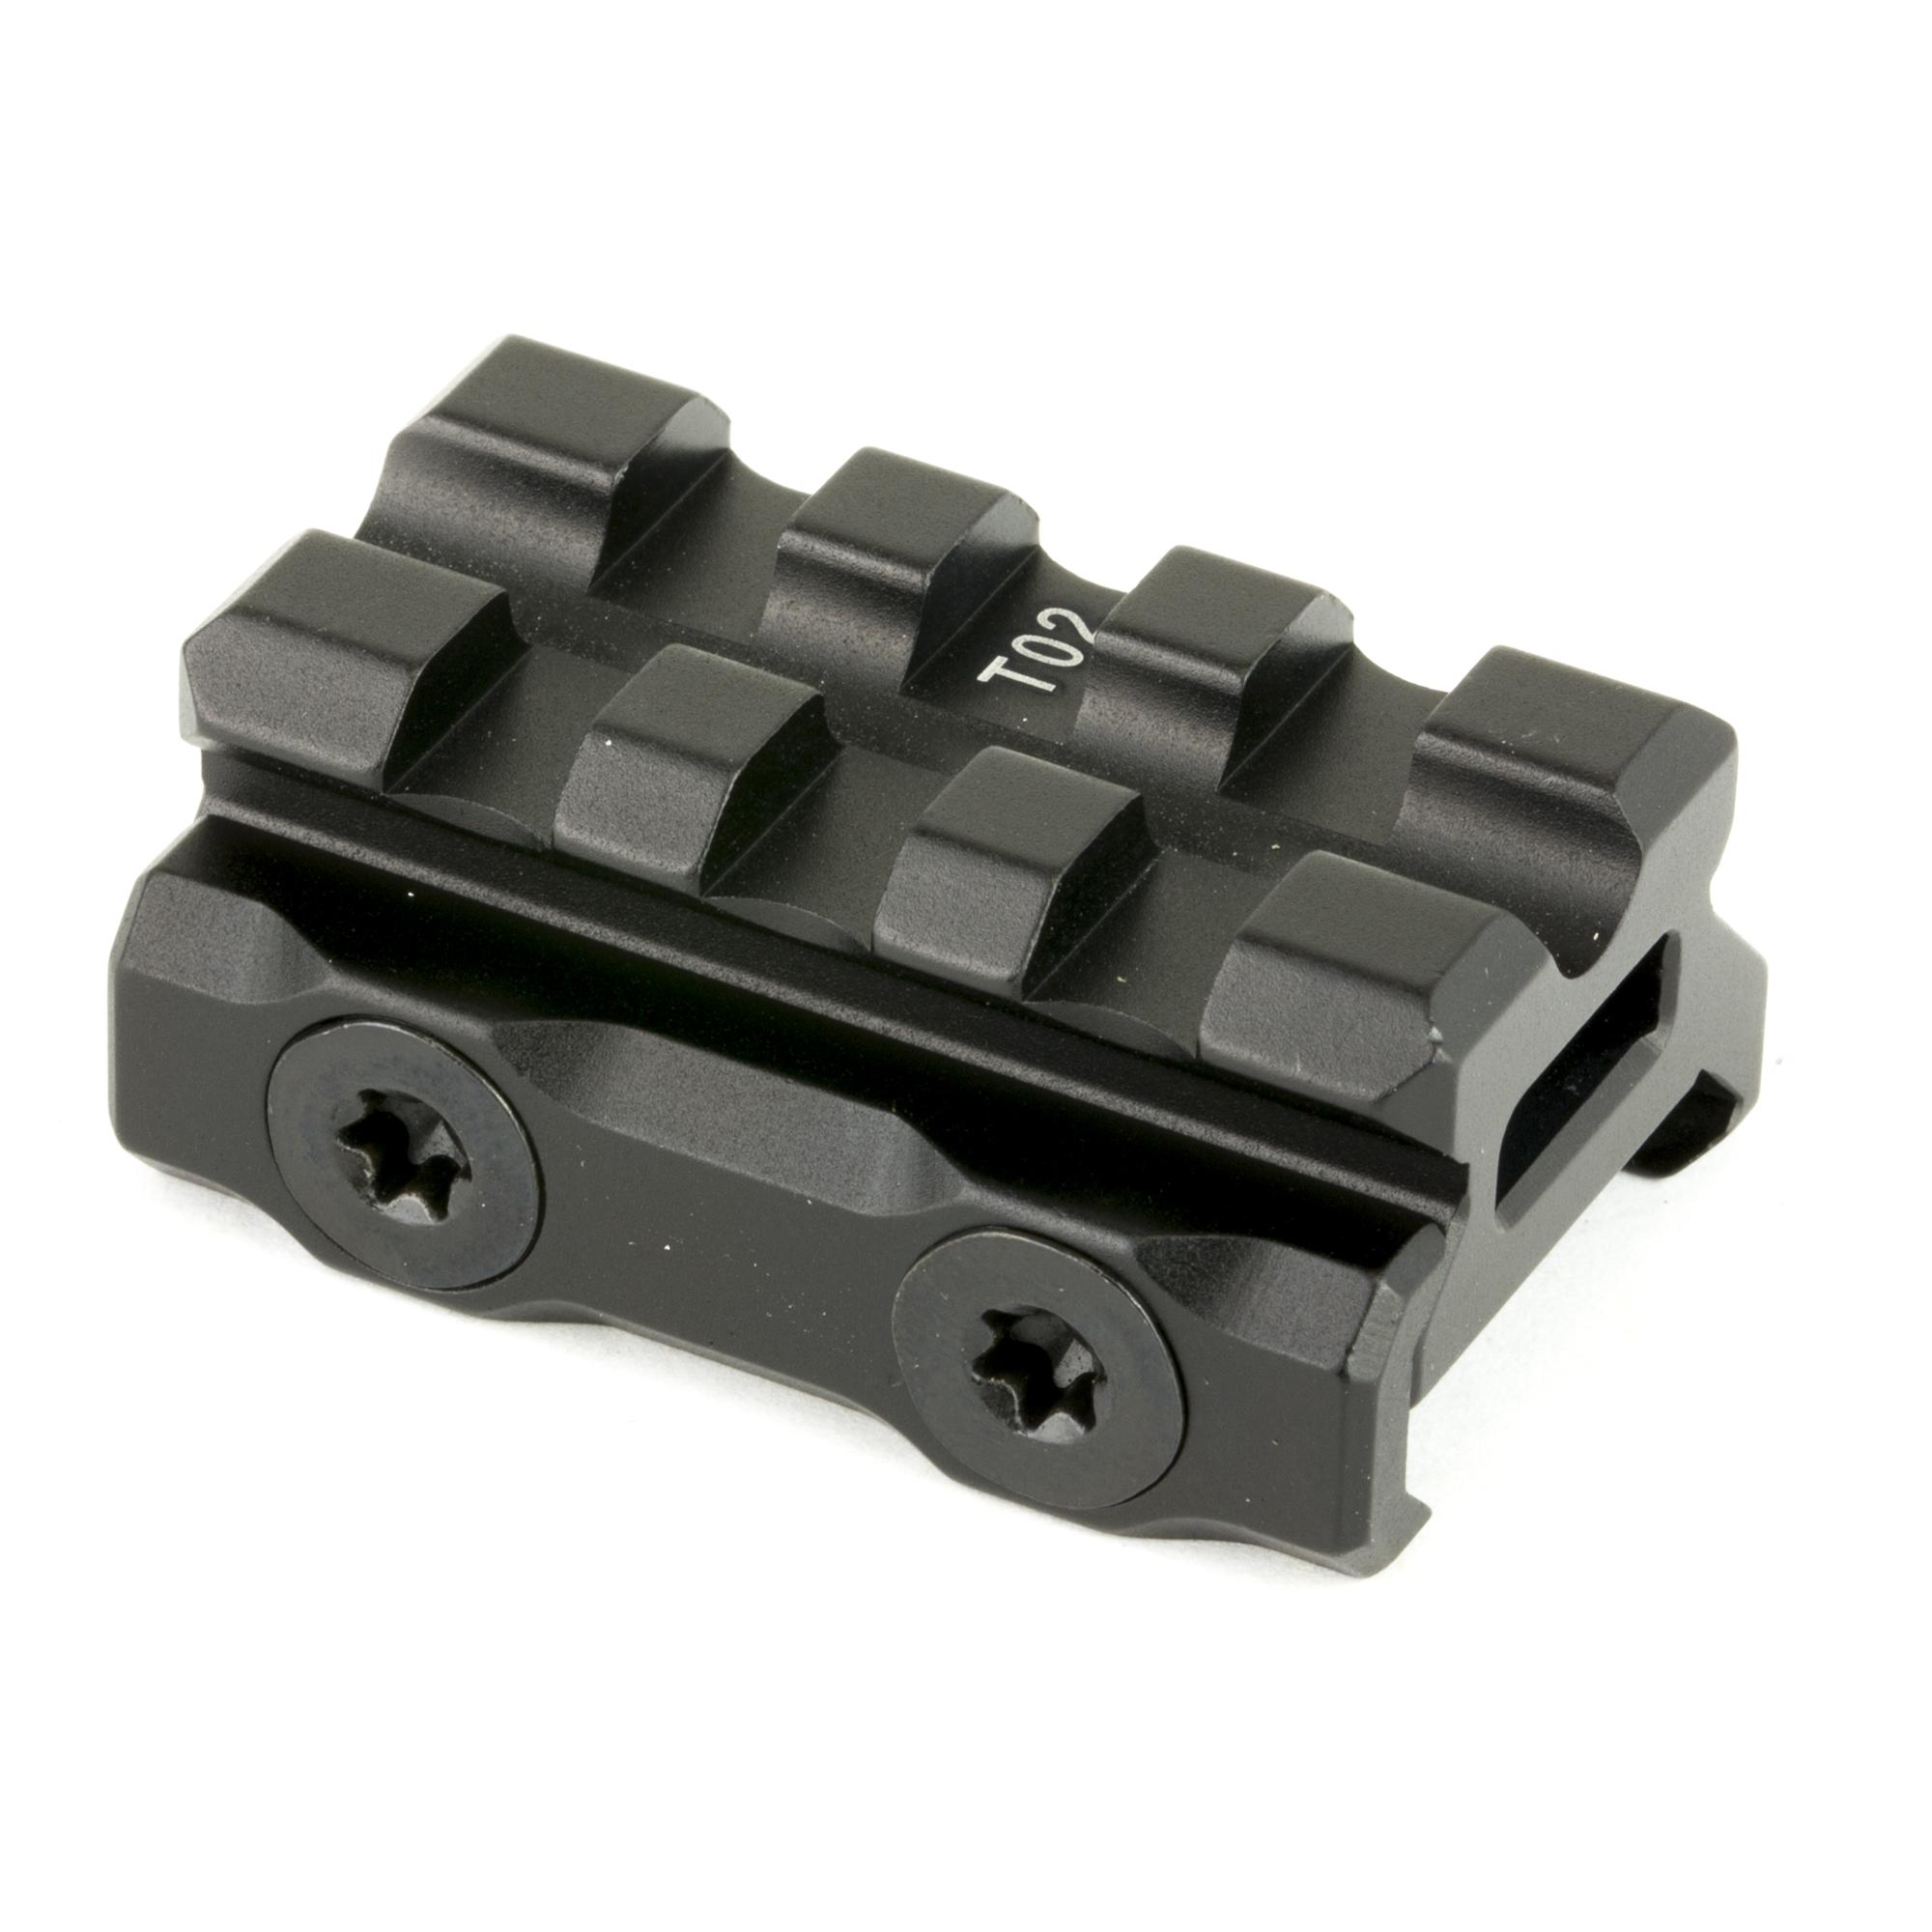 Leapers UTG Super Slim Picatinny Riser Mount - MSR Arms 1